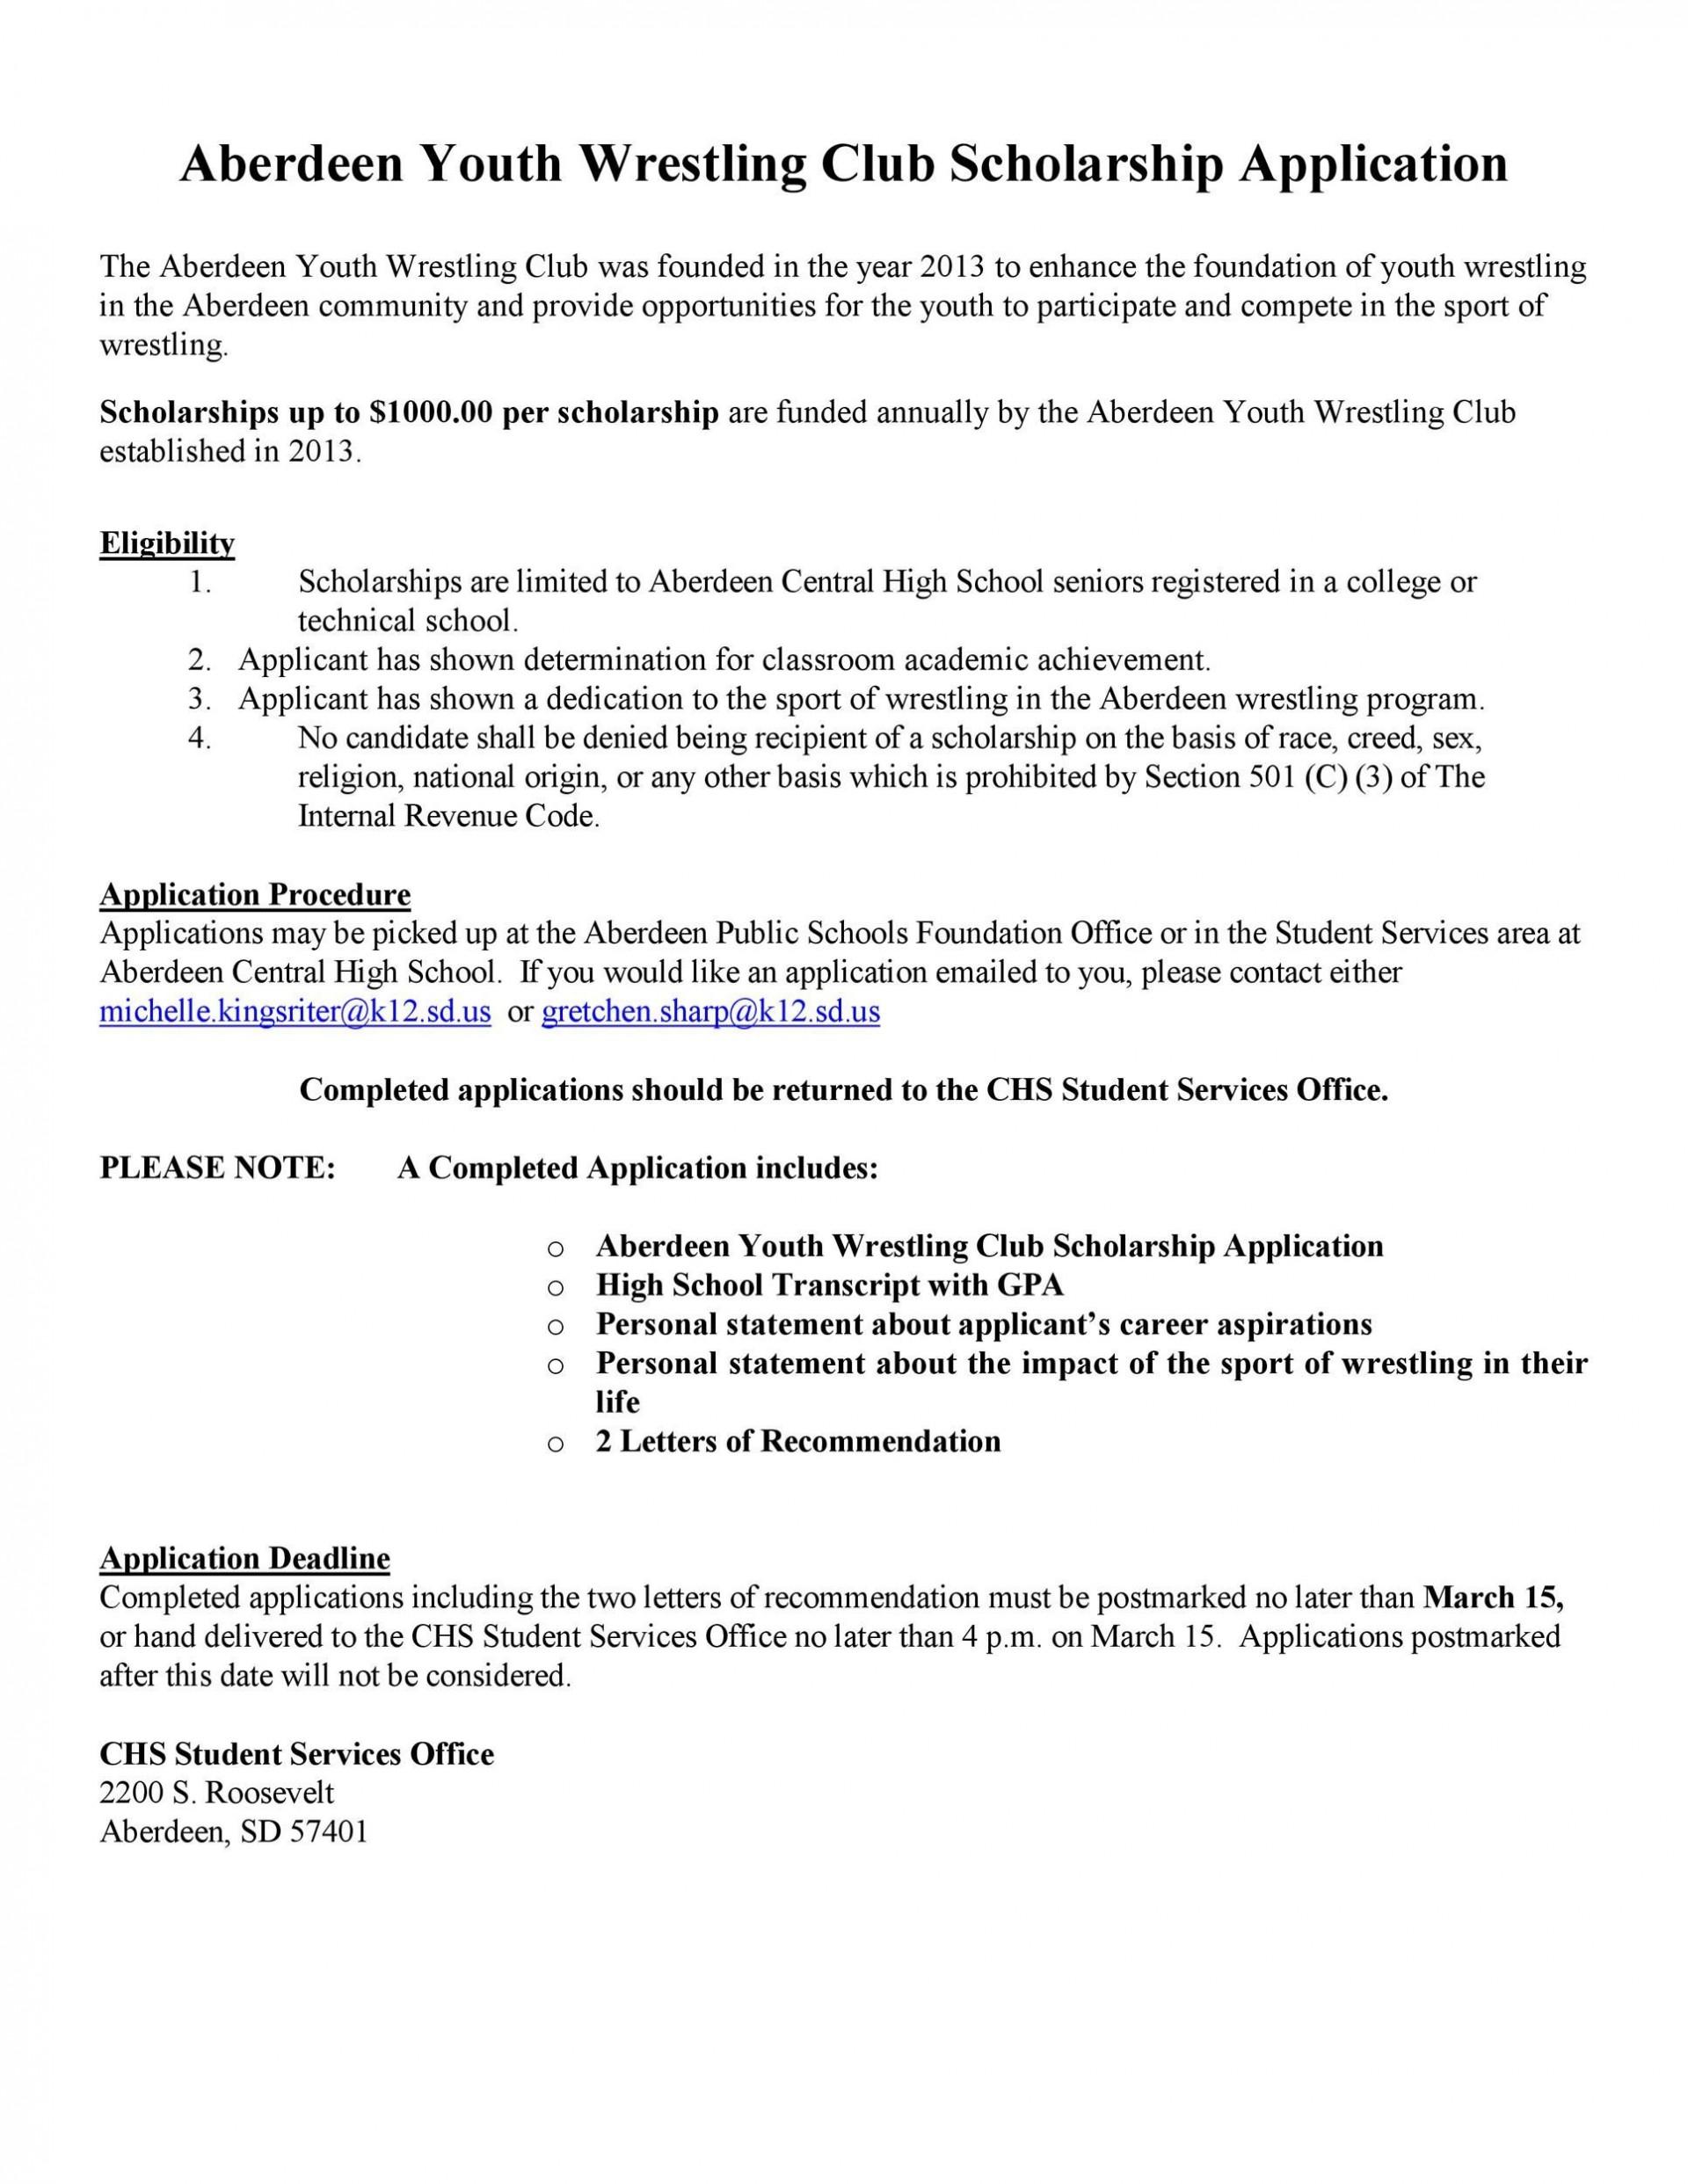 003 Astounding Scholarship Application Template Word Idea  College Letter Sample1920